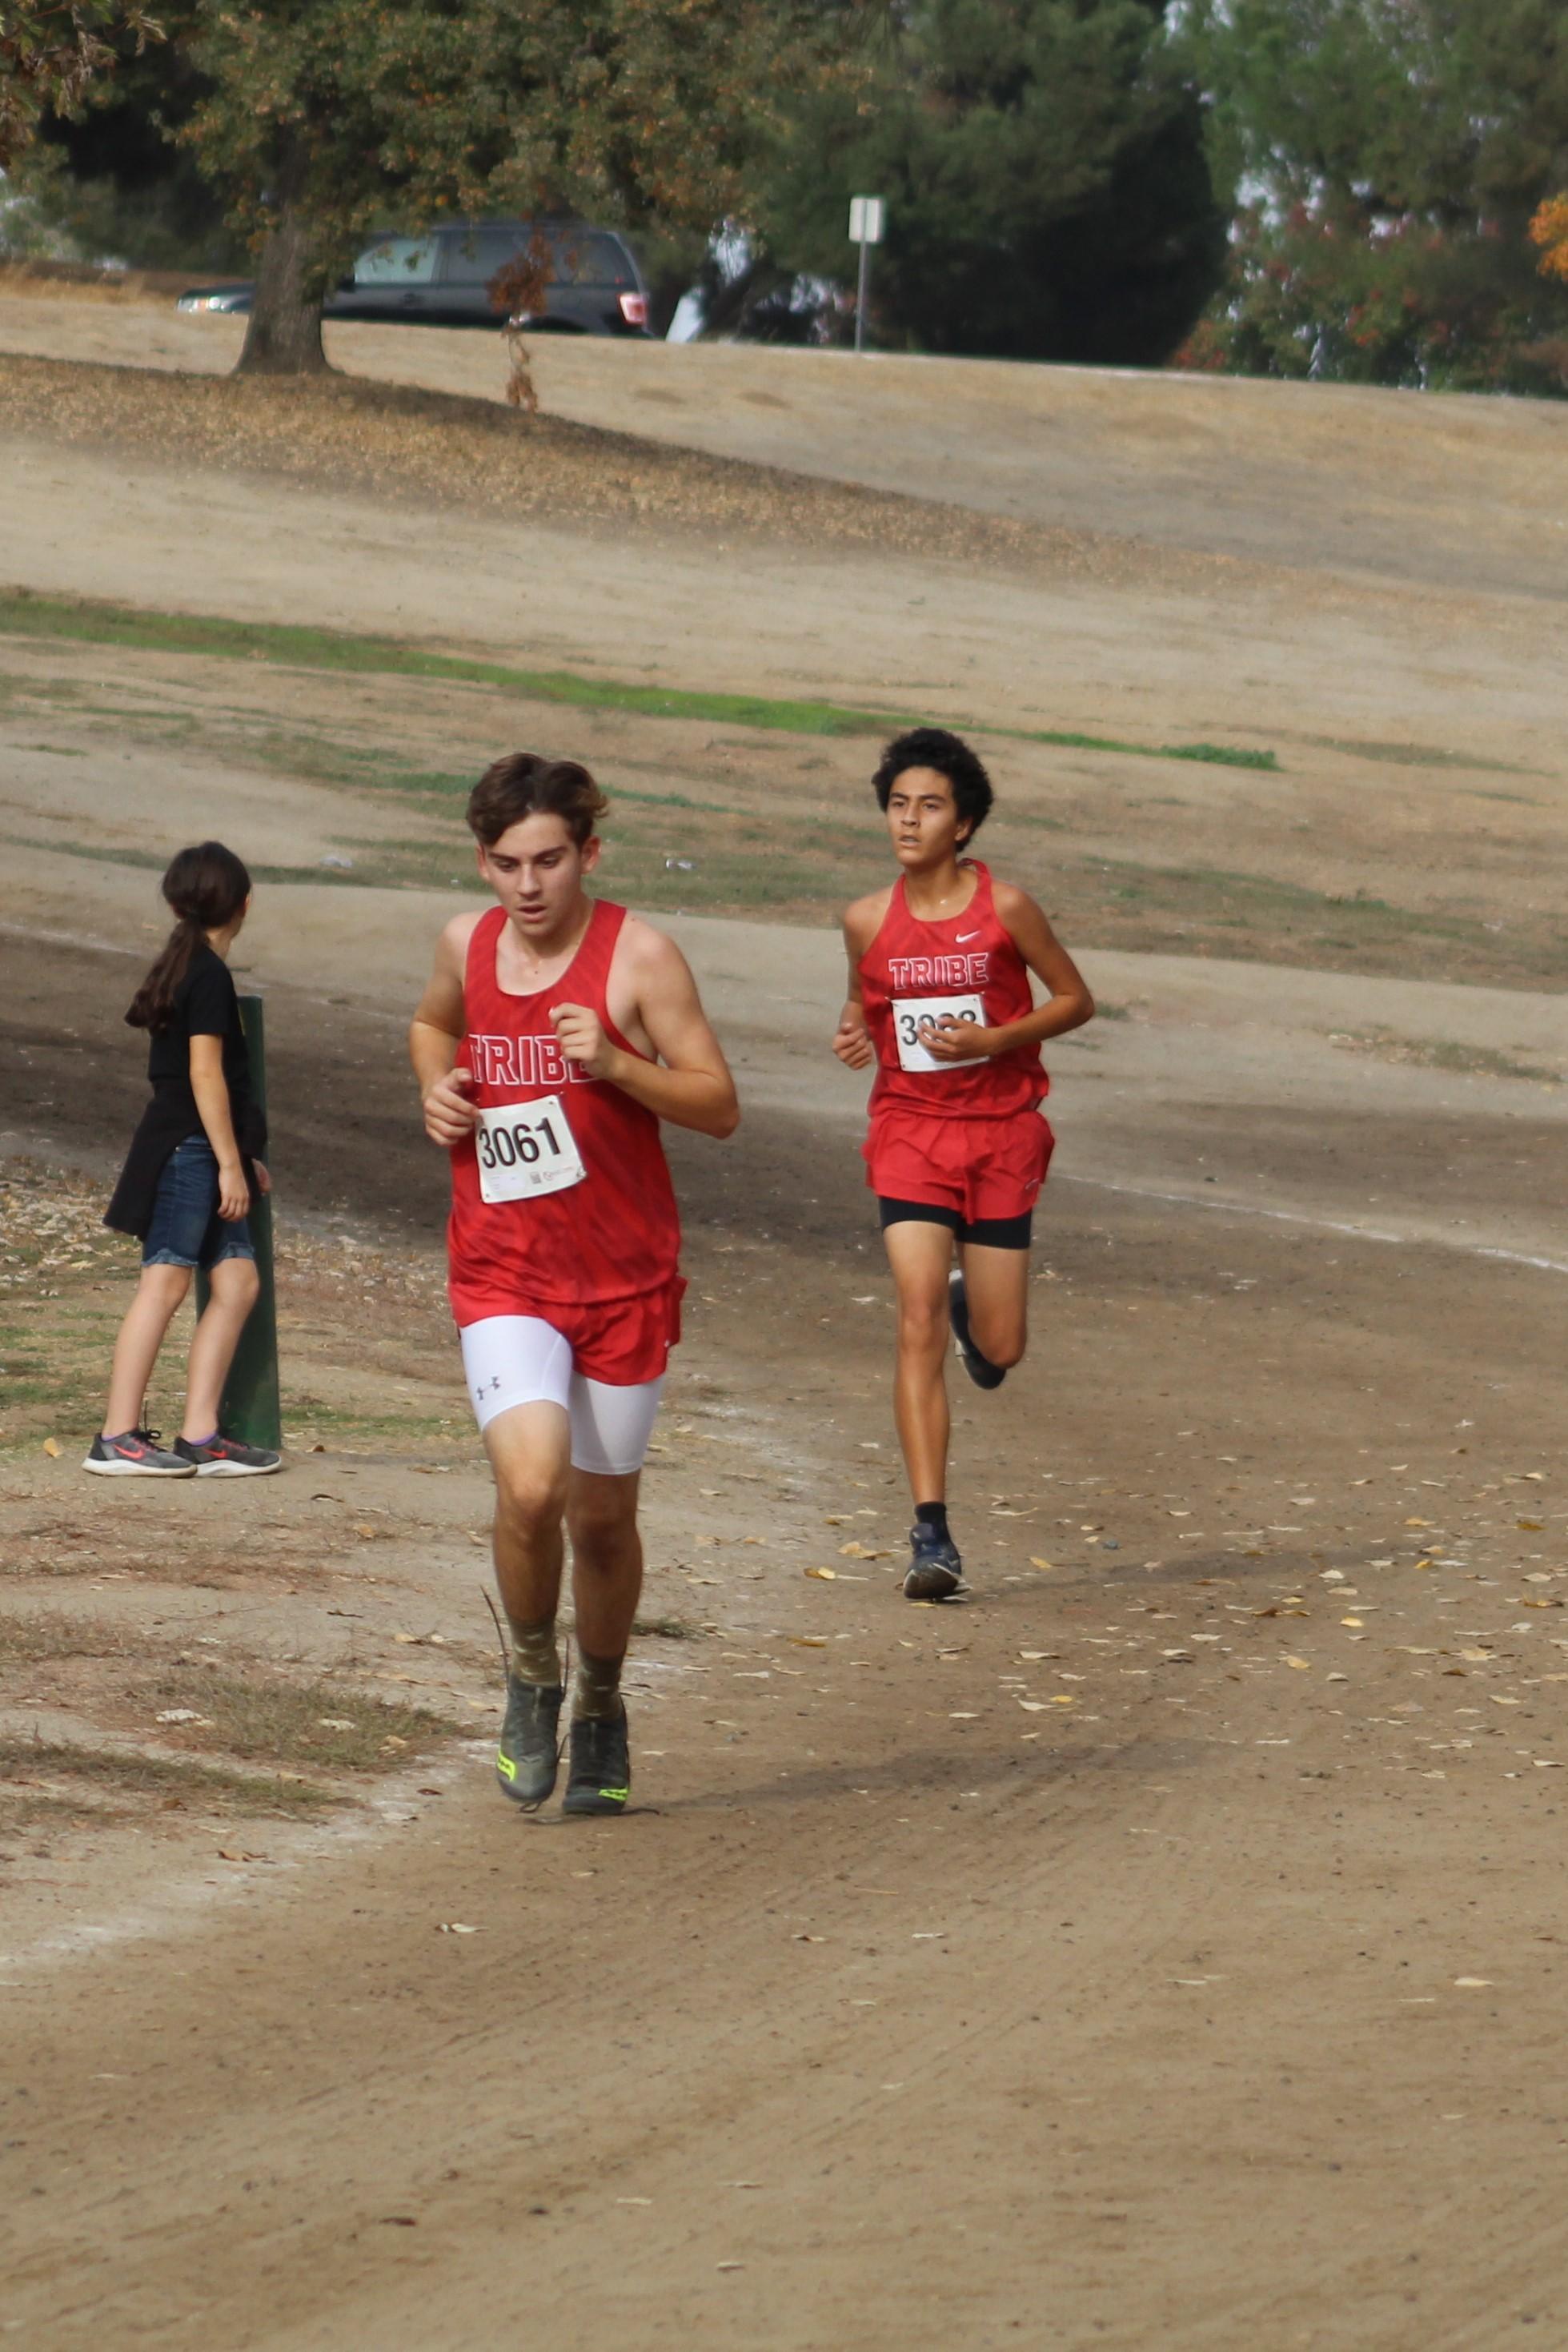 Carson Borba and Nicholas Lopez running